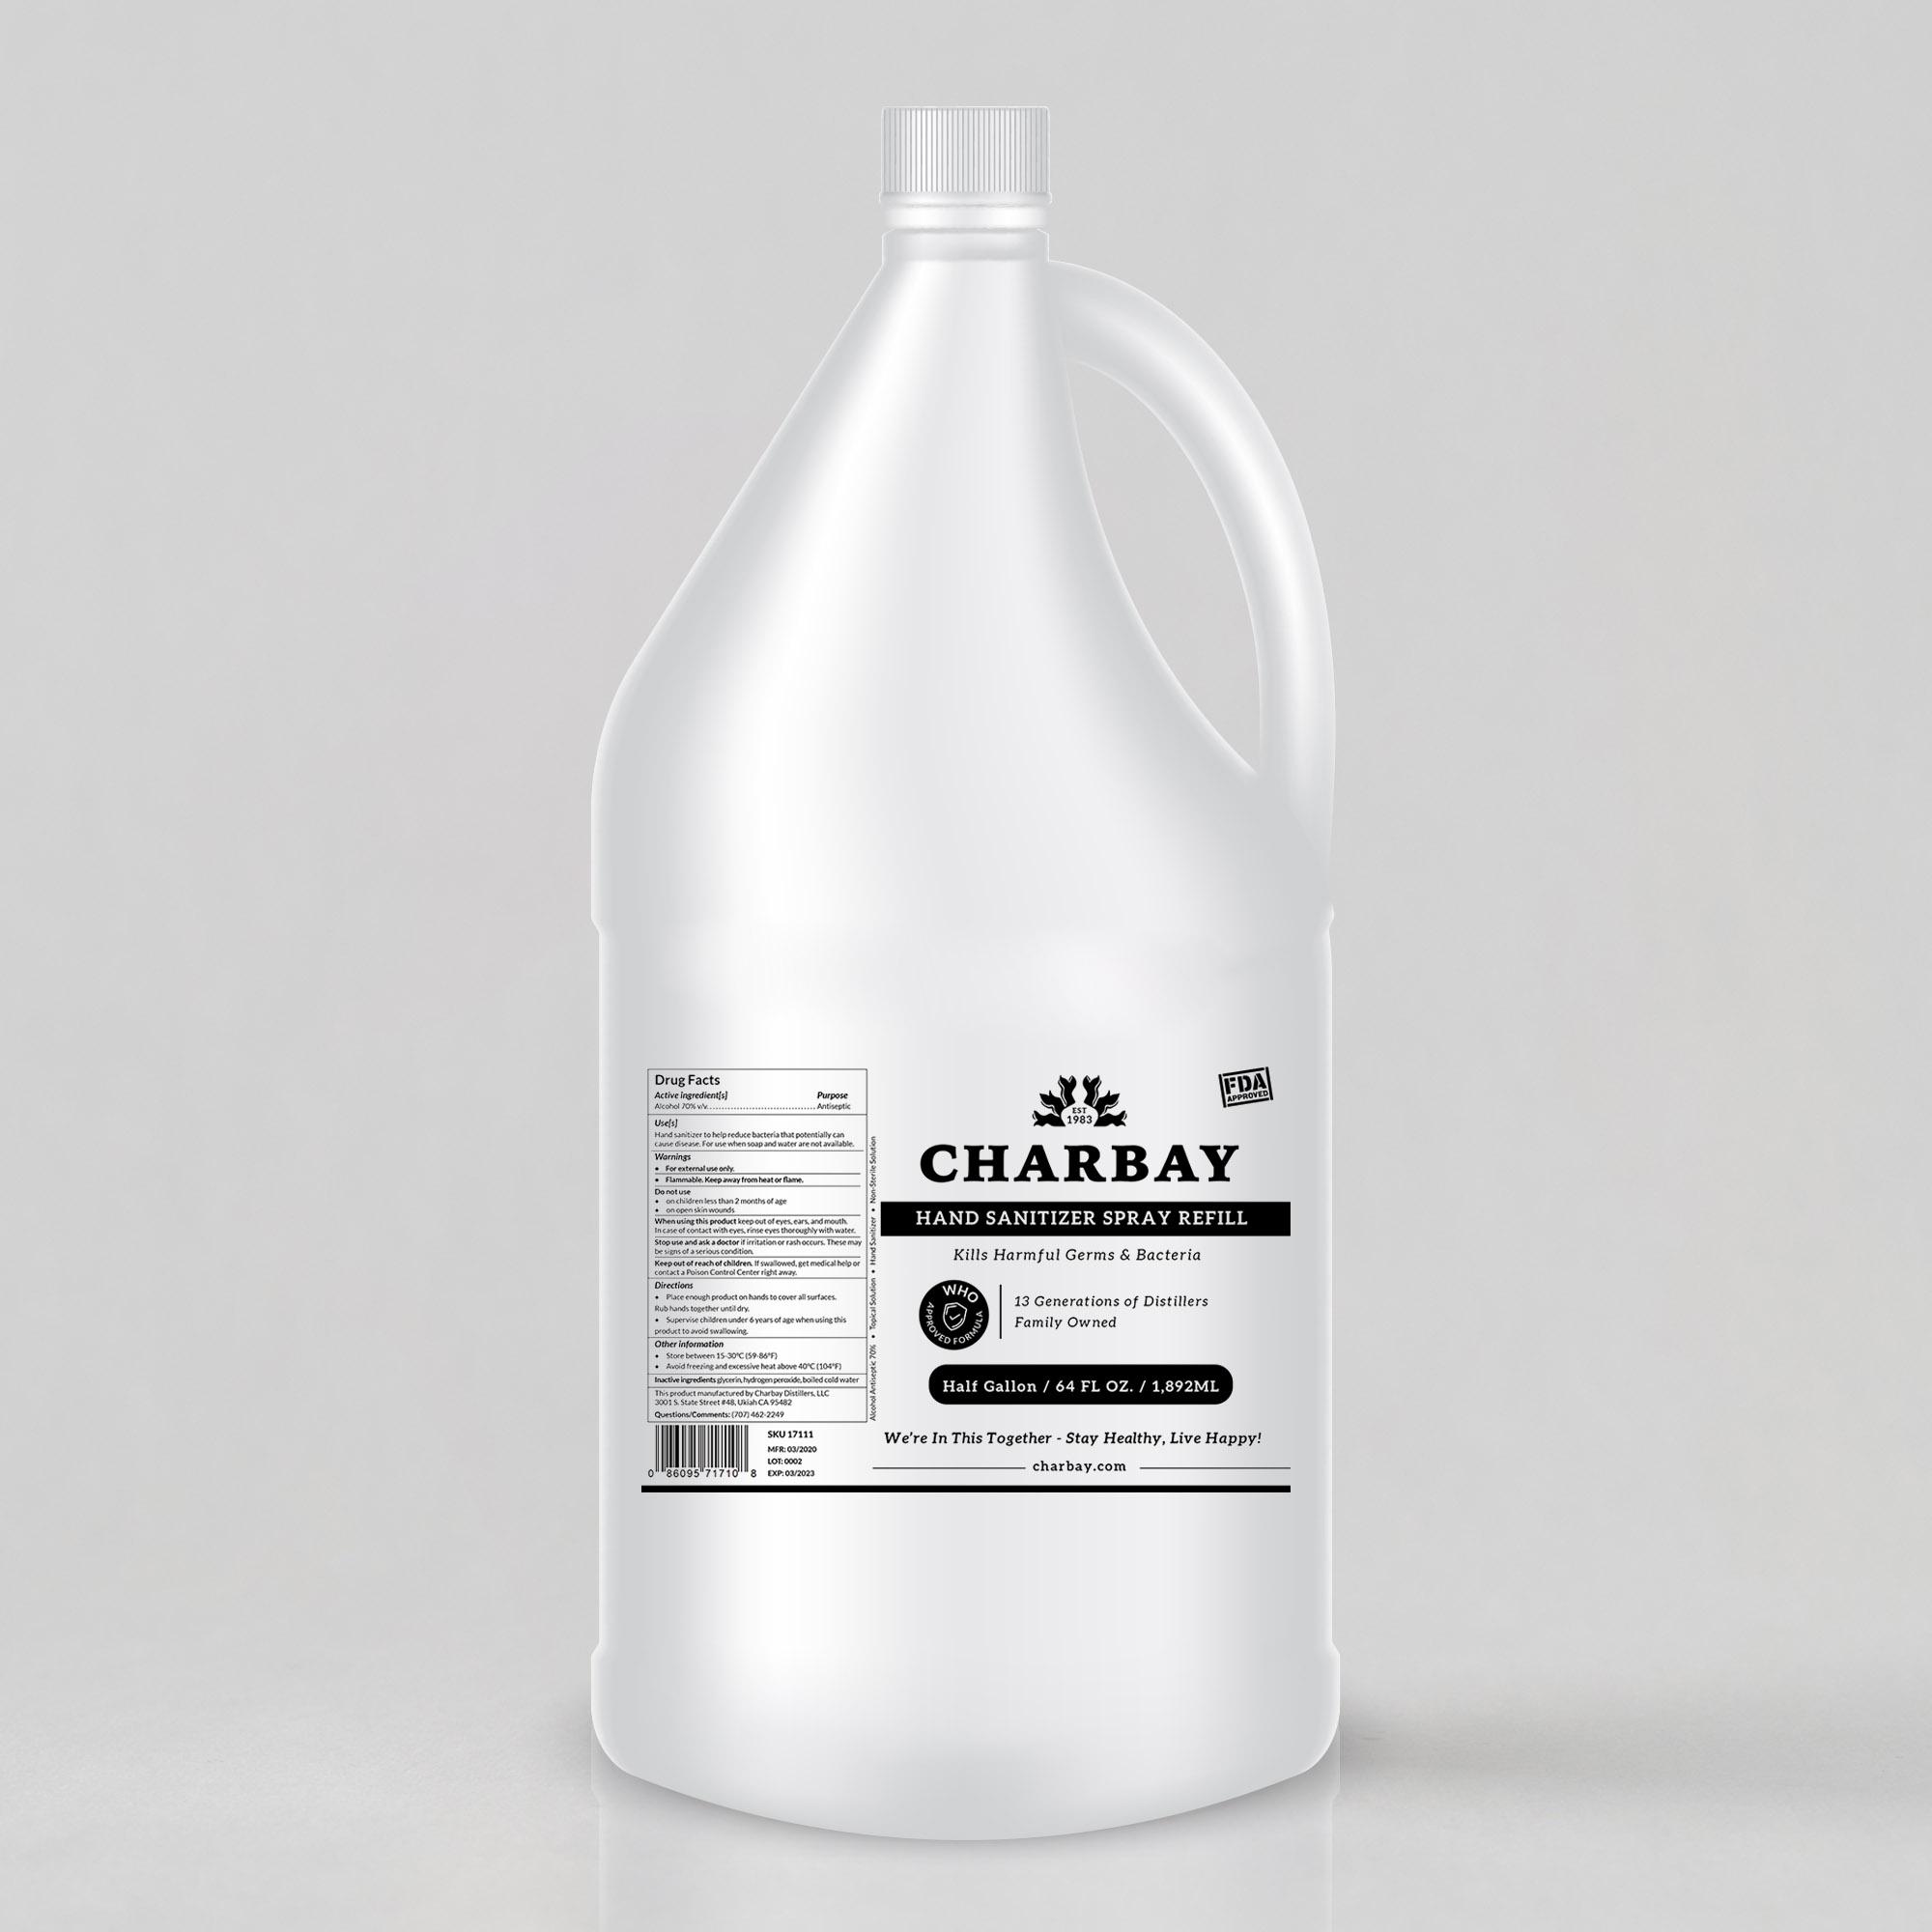 Charbay-64oz-SingleUnit